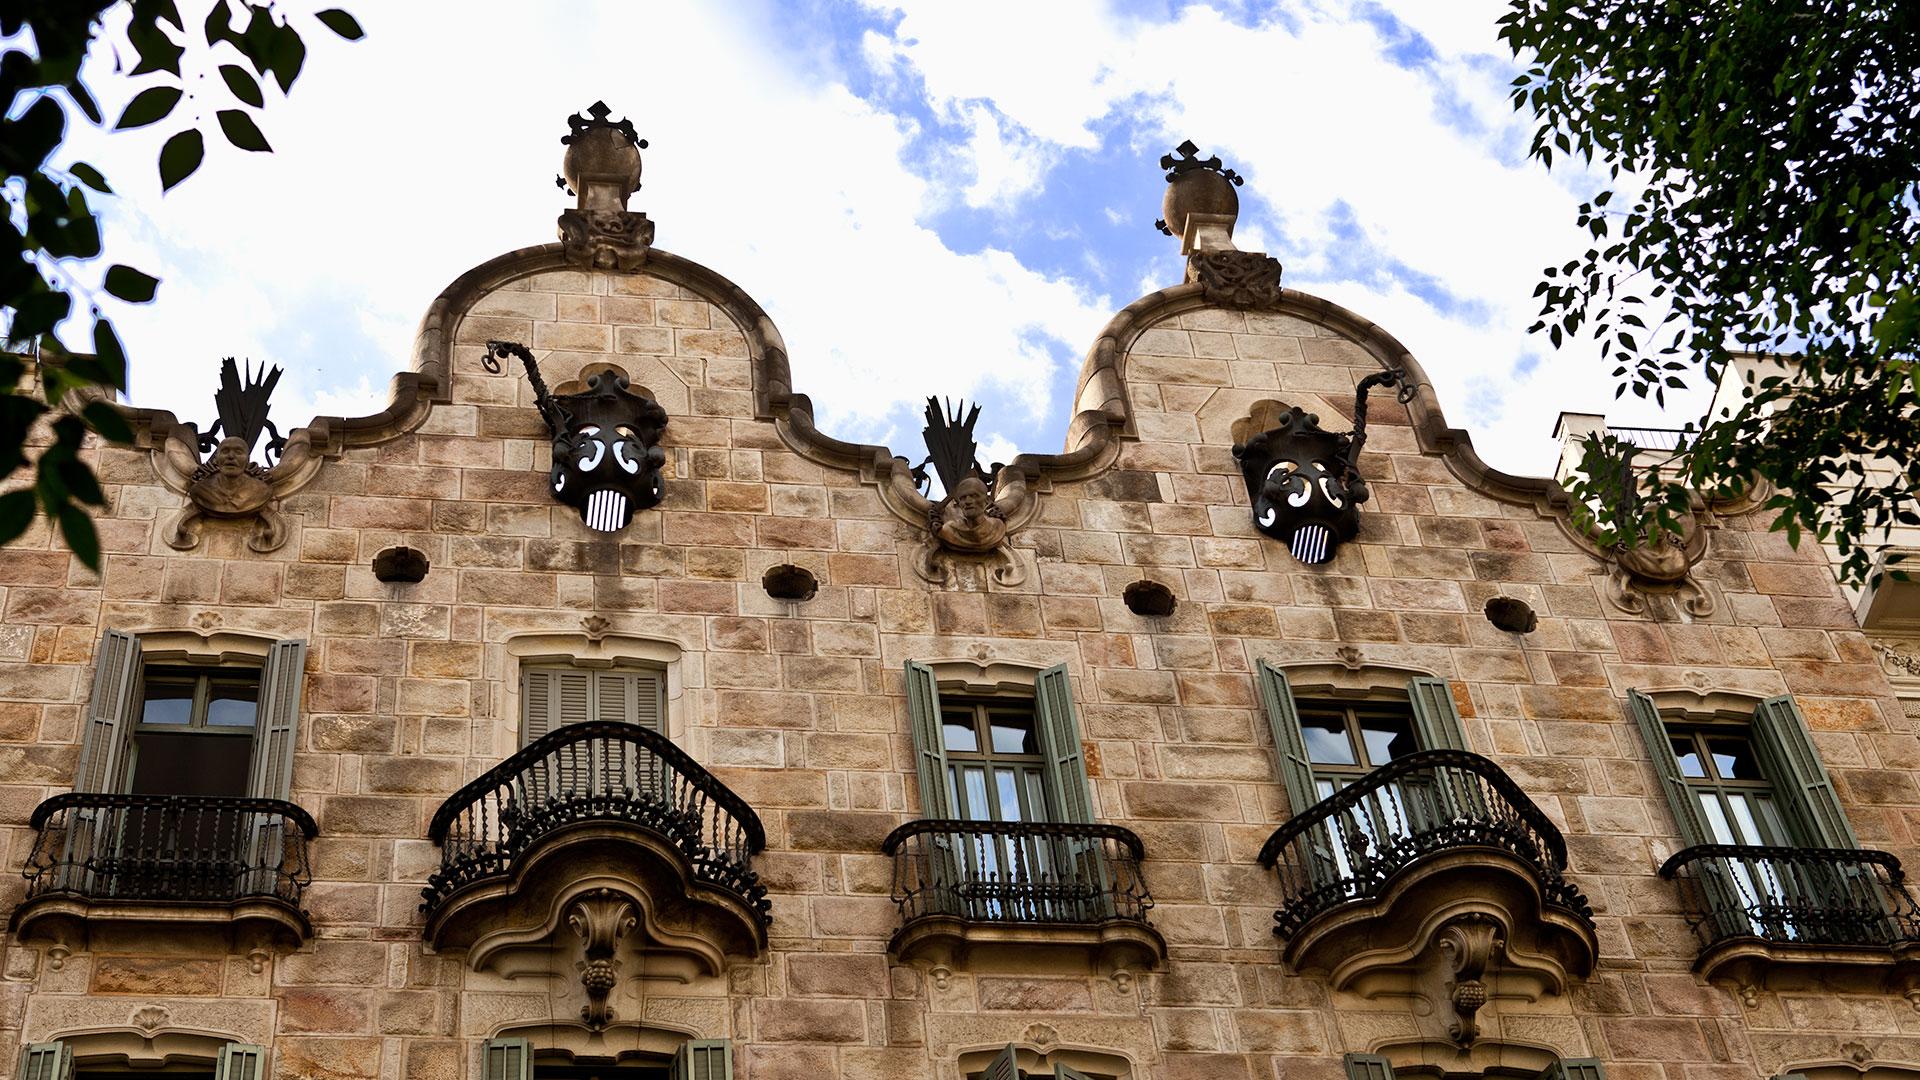 Comer en casa de Gaudí hero asset